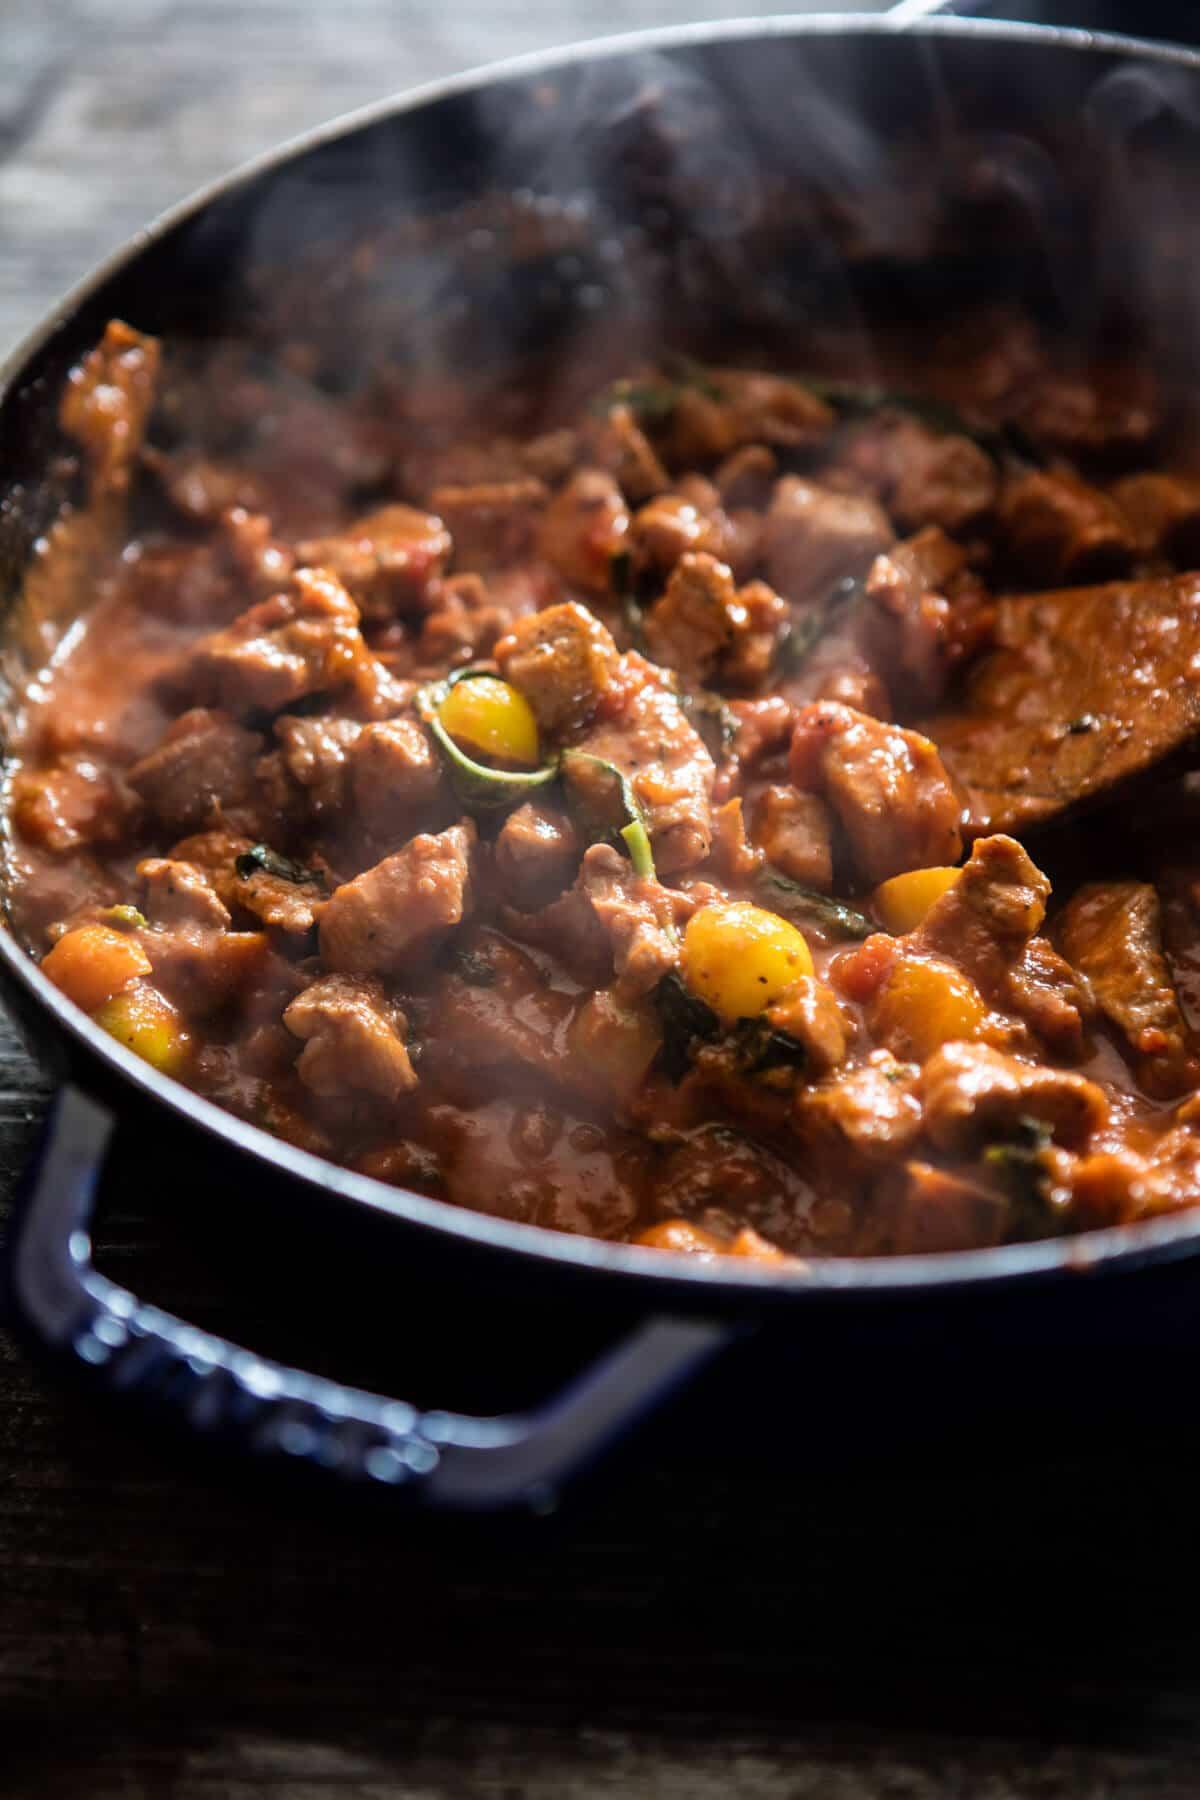 30 Minute Garlic Butter Pasta with Herbed Pork Bolognese | halfbakedharvest.com @hbharvest